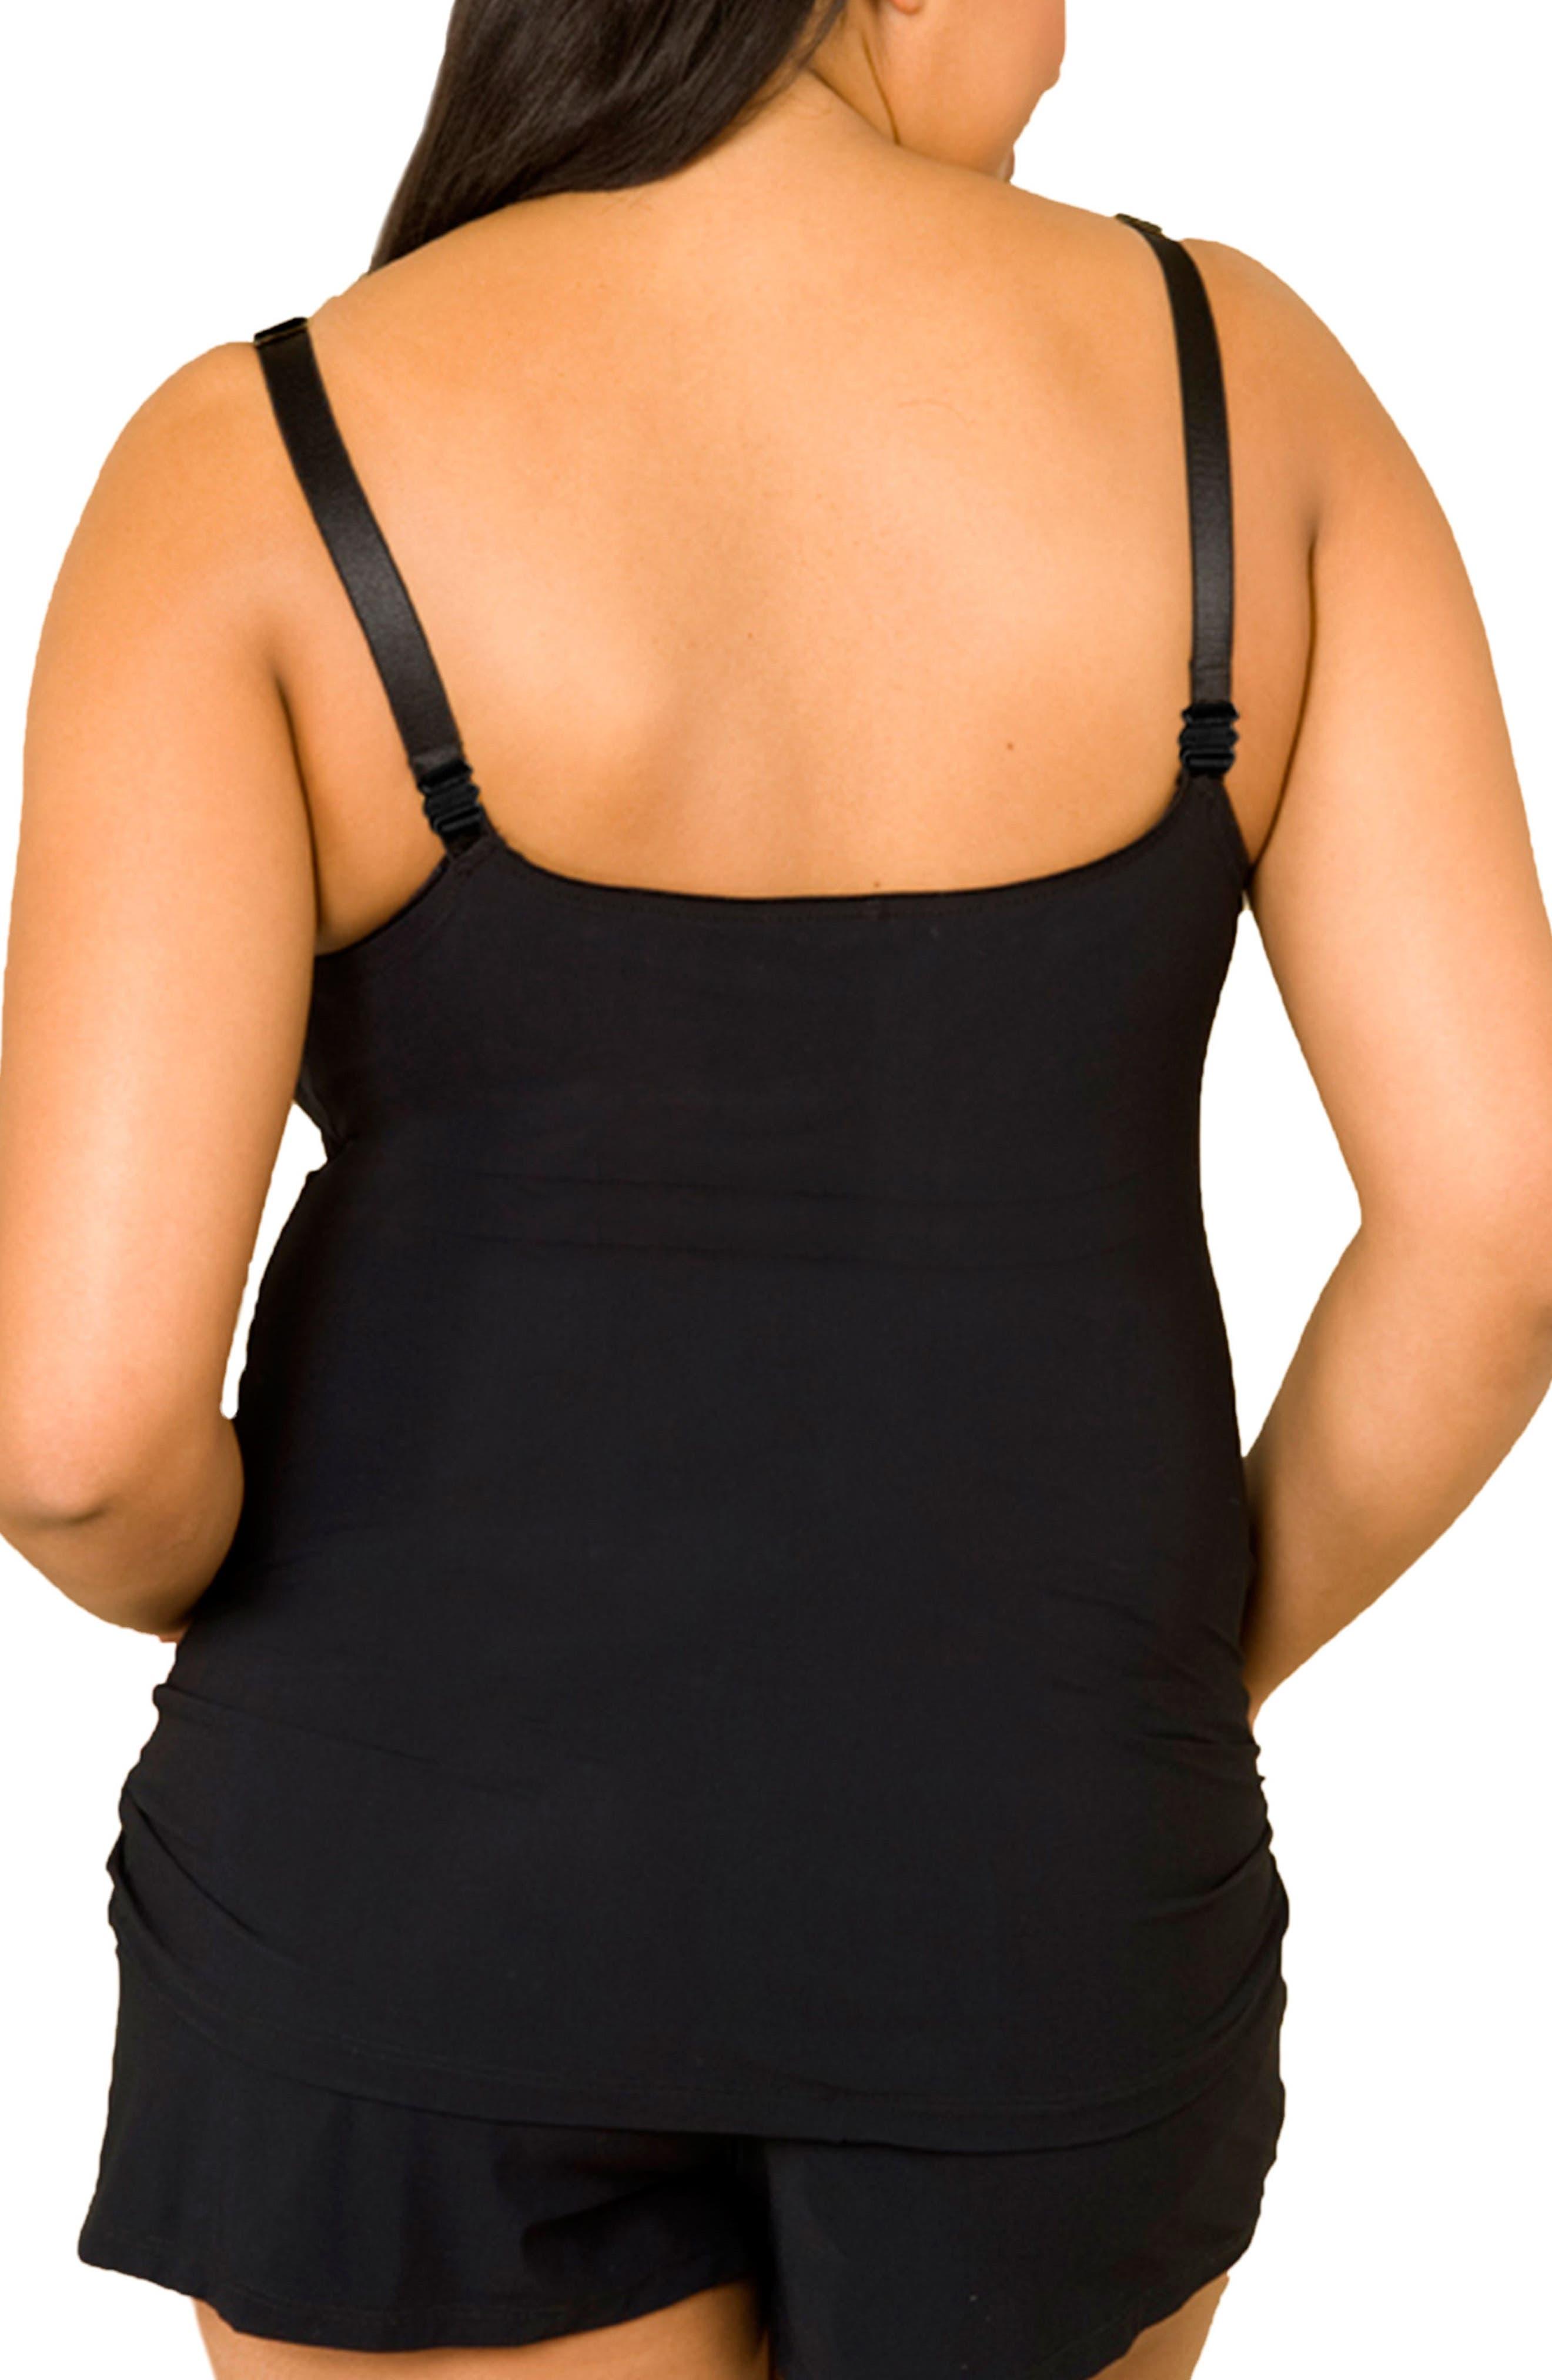 Alternate Image 2  - Bella Materna Choice Full Figure Maternity/Nursing Camisole